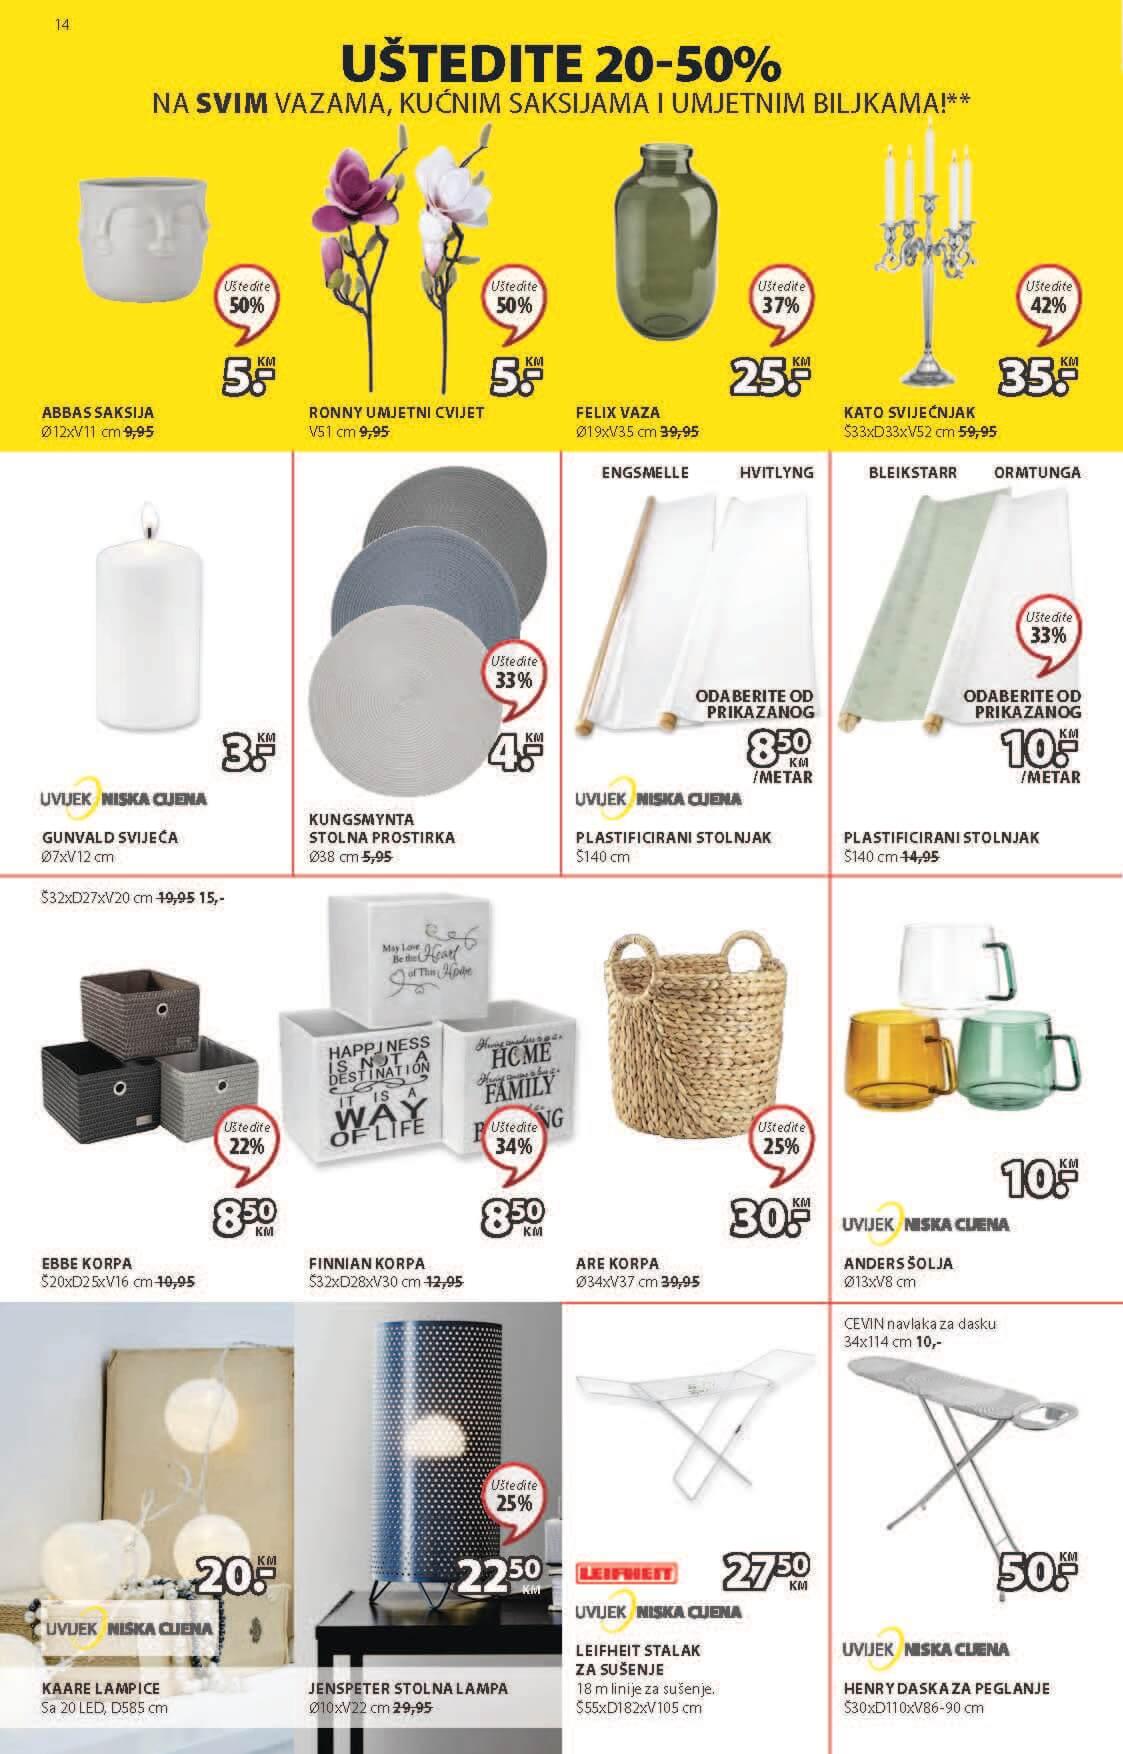 JYSK Katalog Akcijska rasprodaja JUN JUL 2021 24.6. 7.7. Page 15